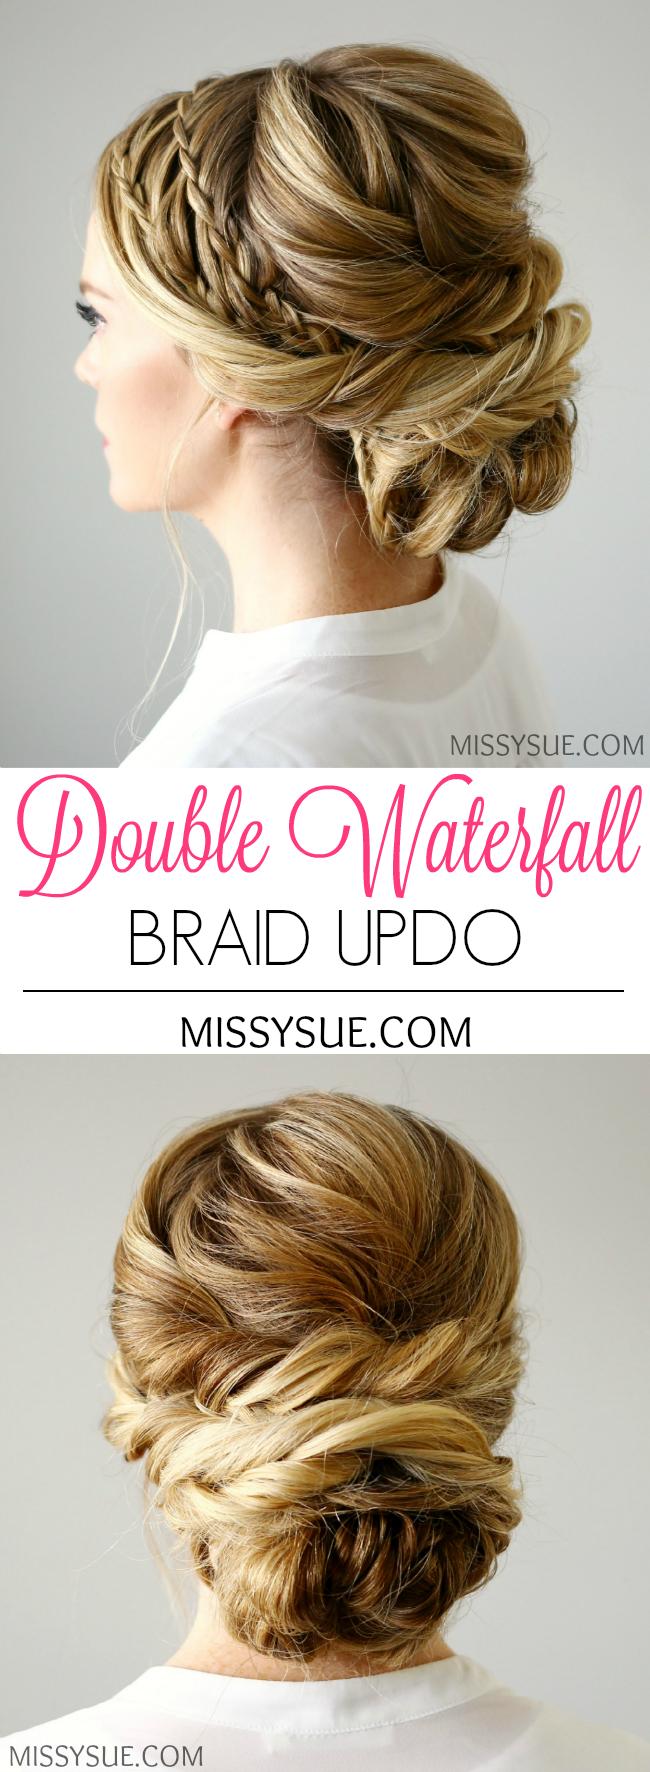 Double Waterfall Braids Updo | Waterfall braid updo, Double ...